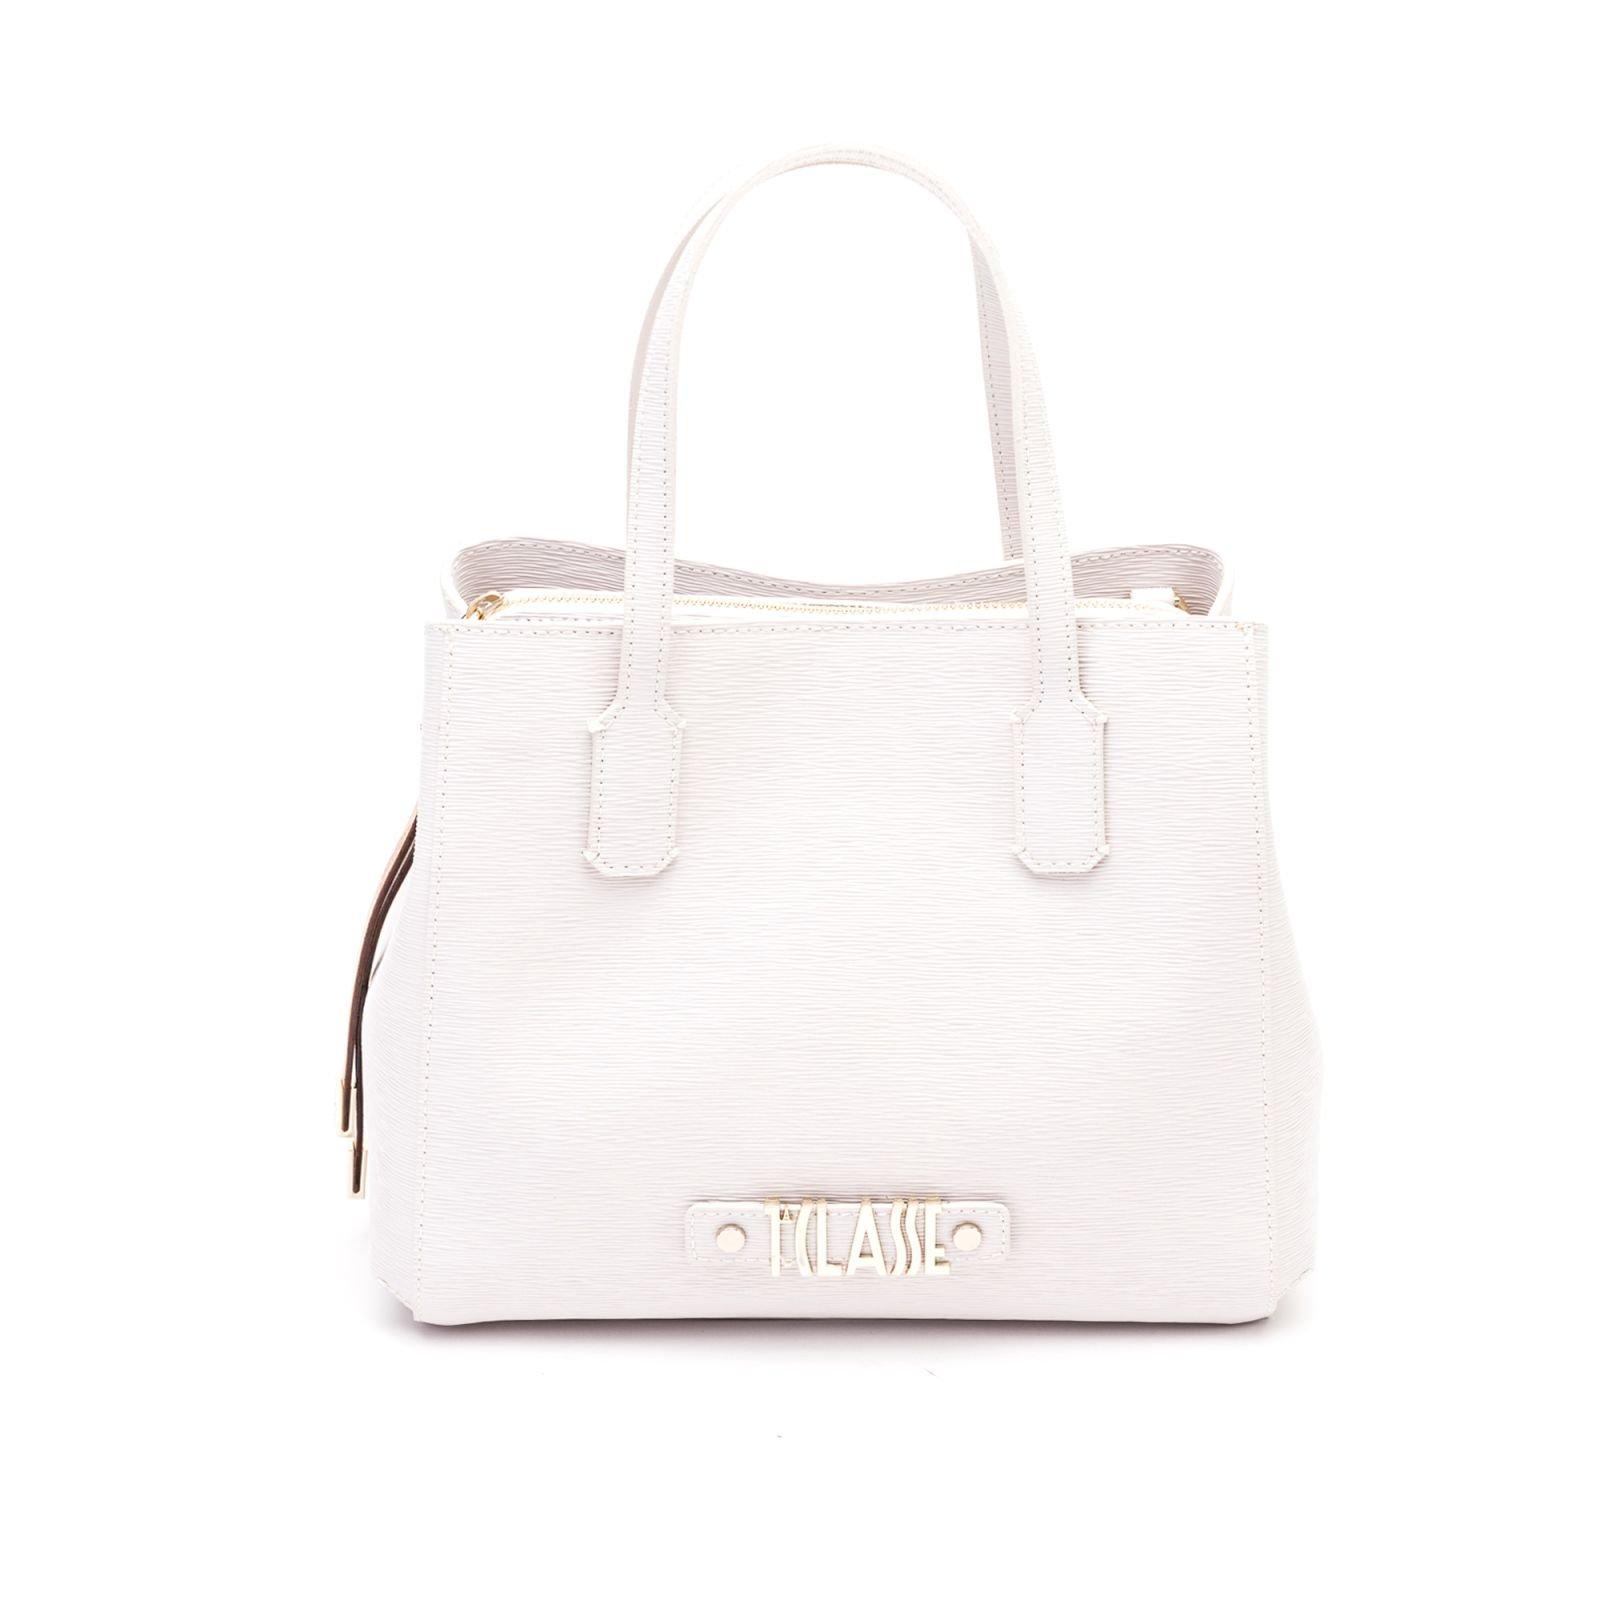 Alviero Martini Shoulder Bag